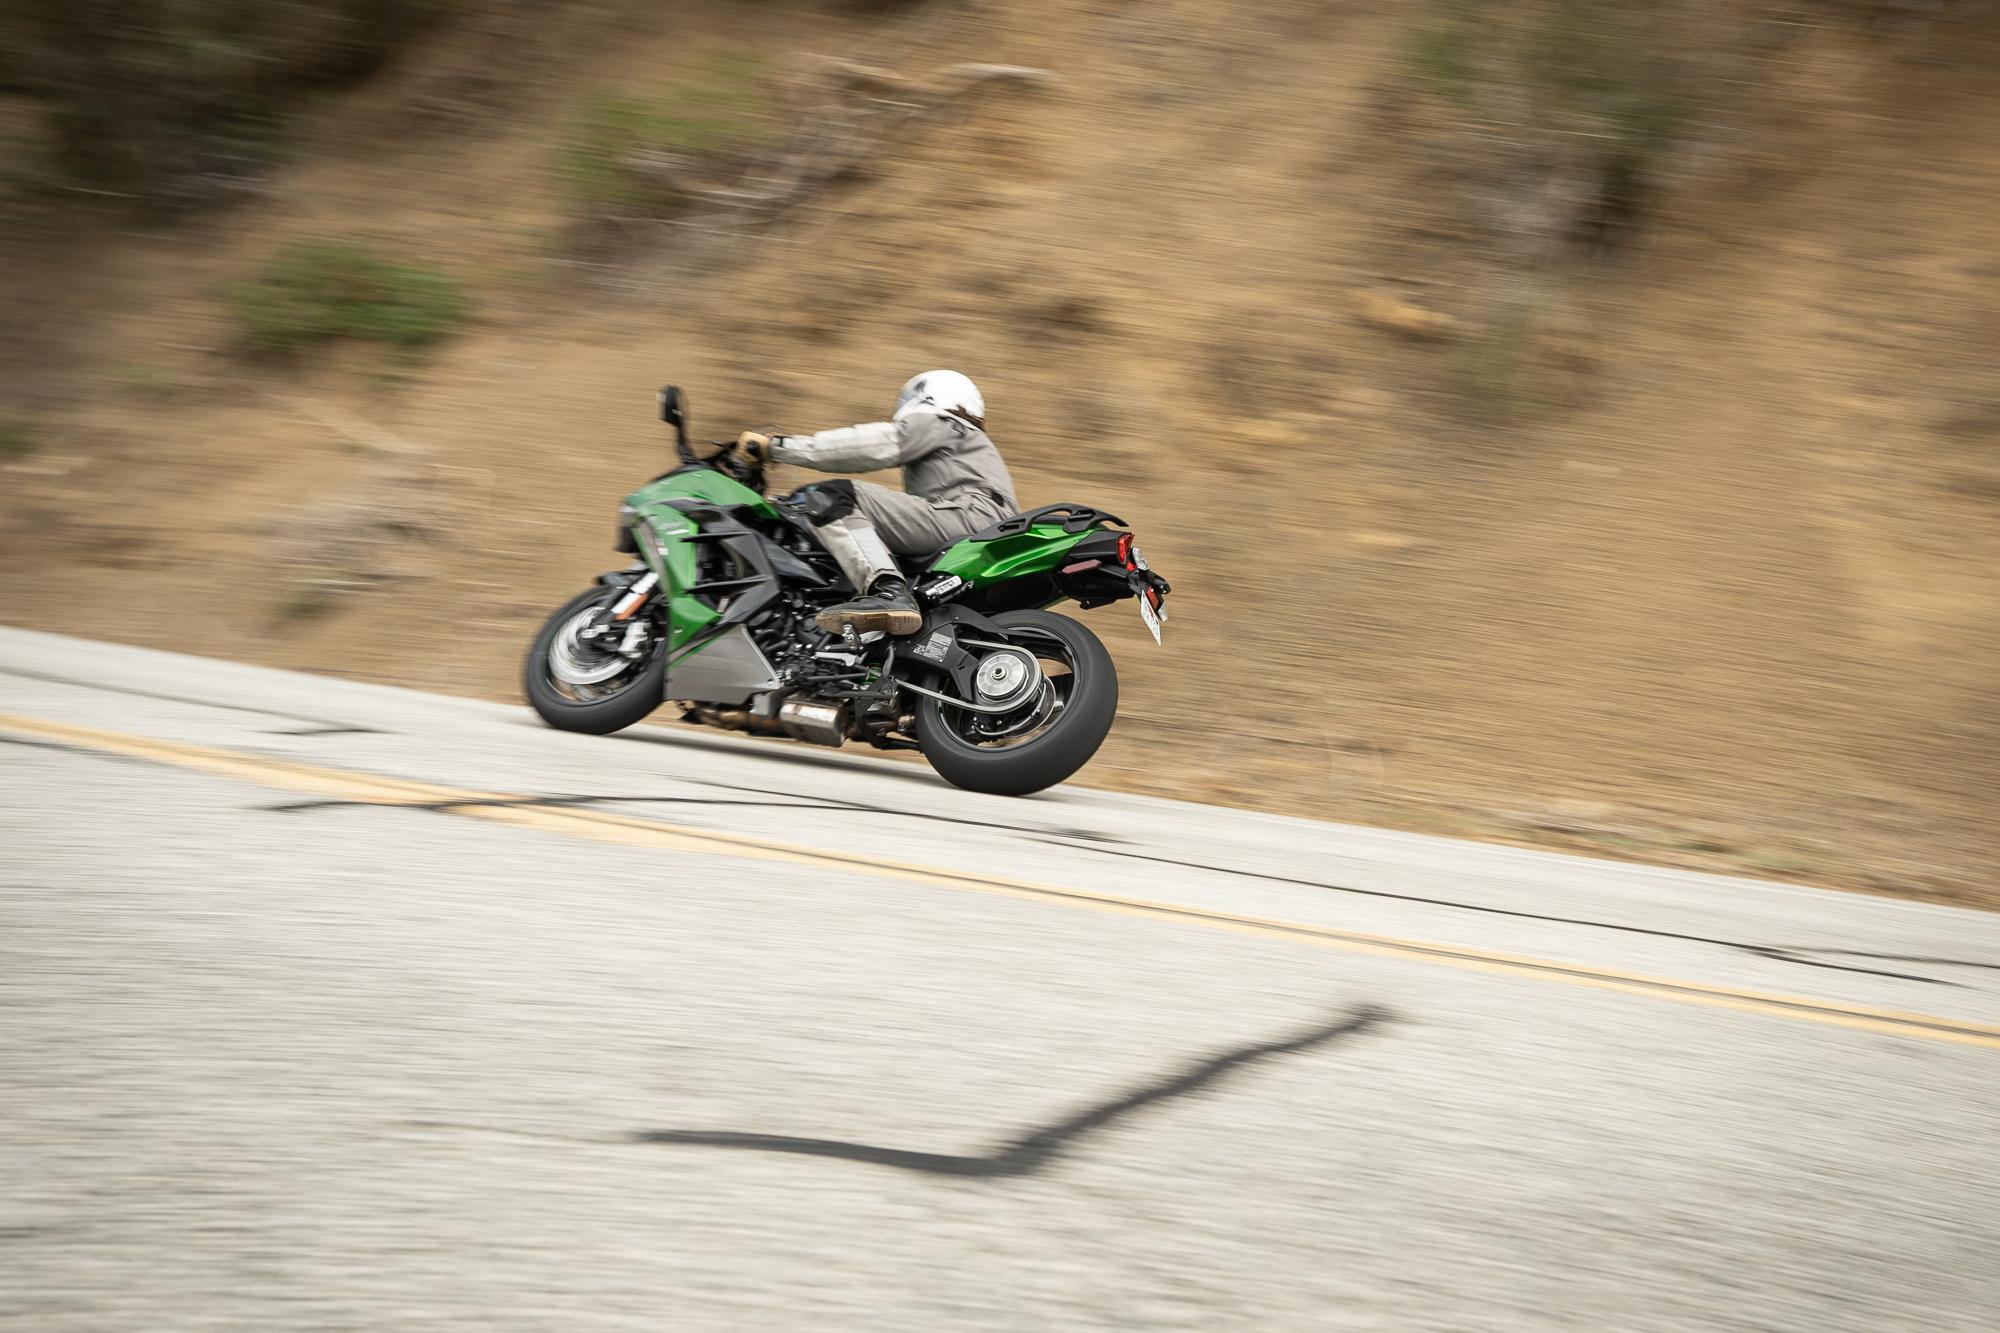 2021 Kawasaki H2 SX-SE rear three-quarter action